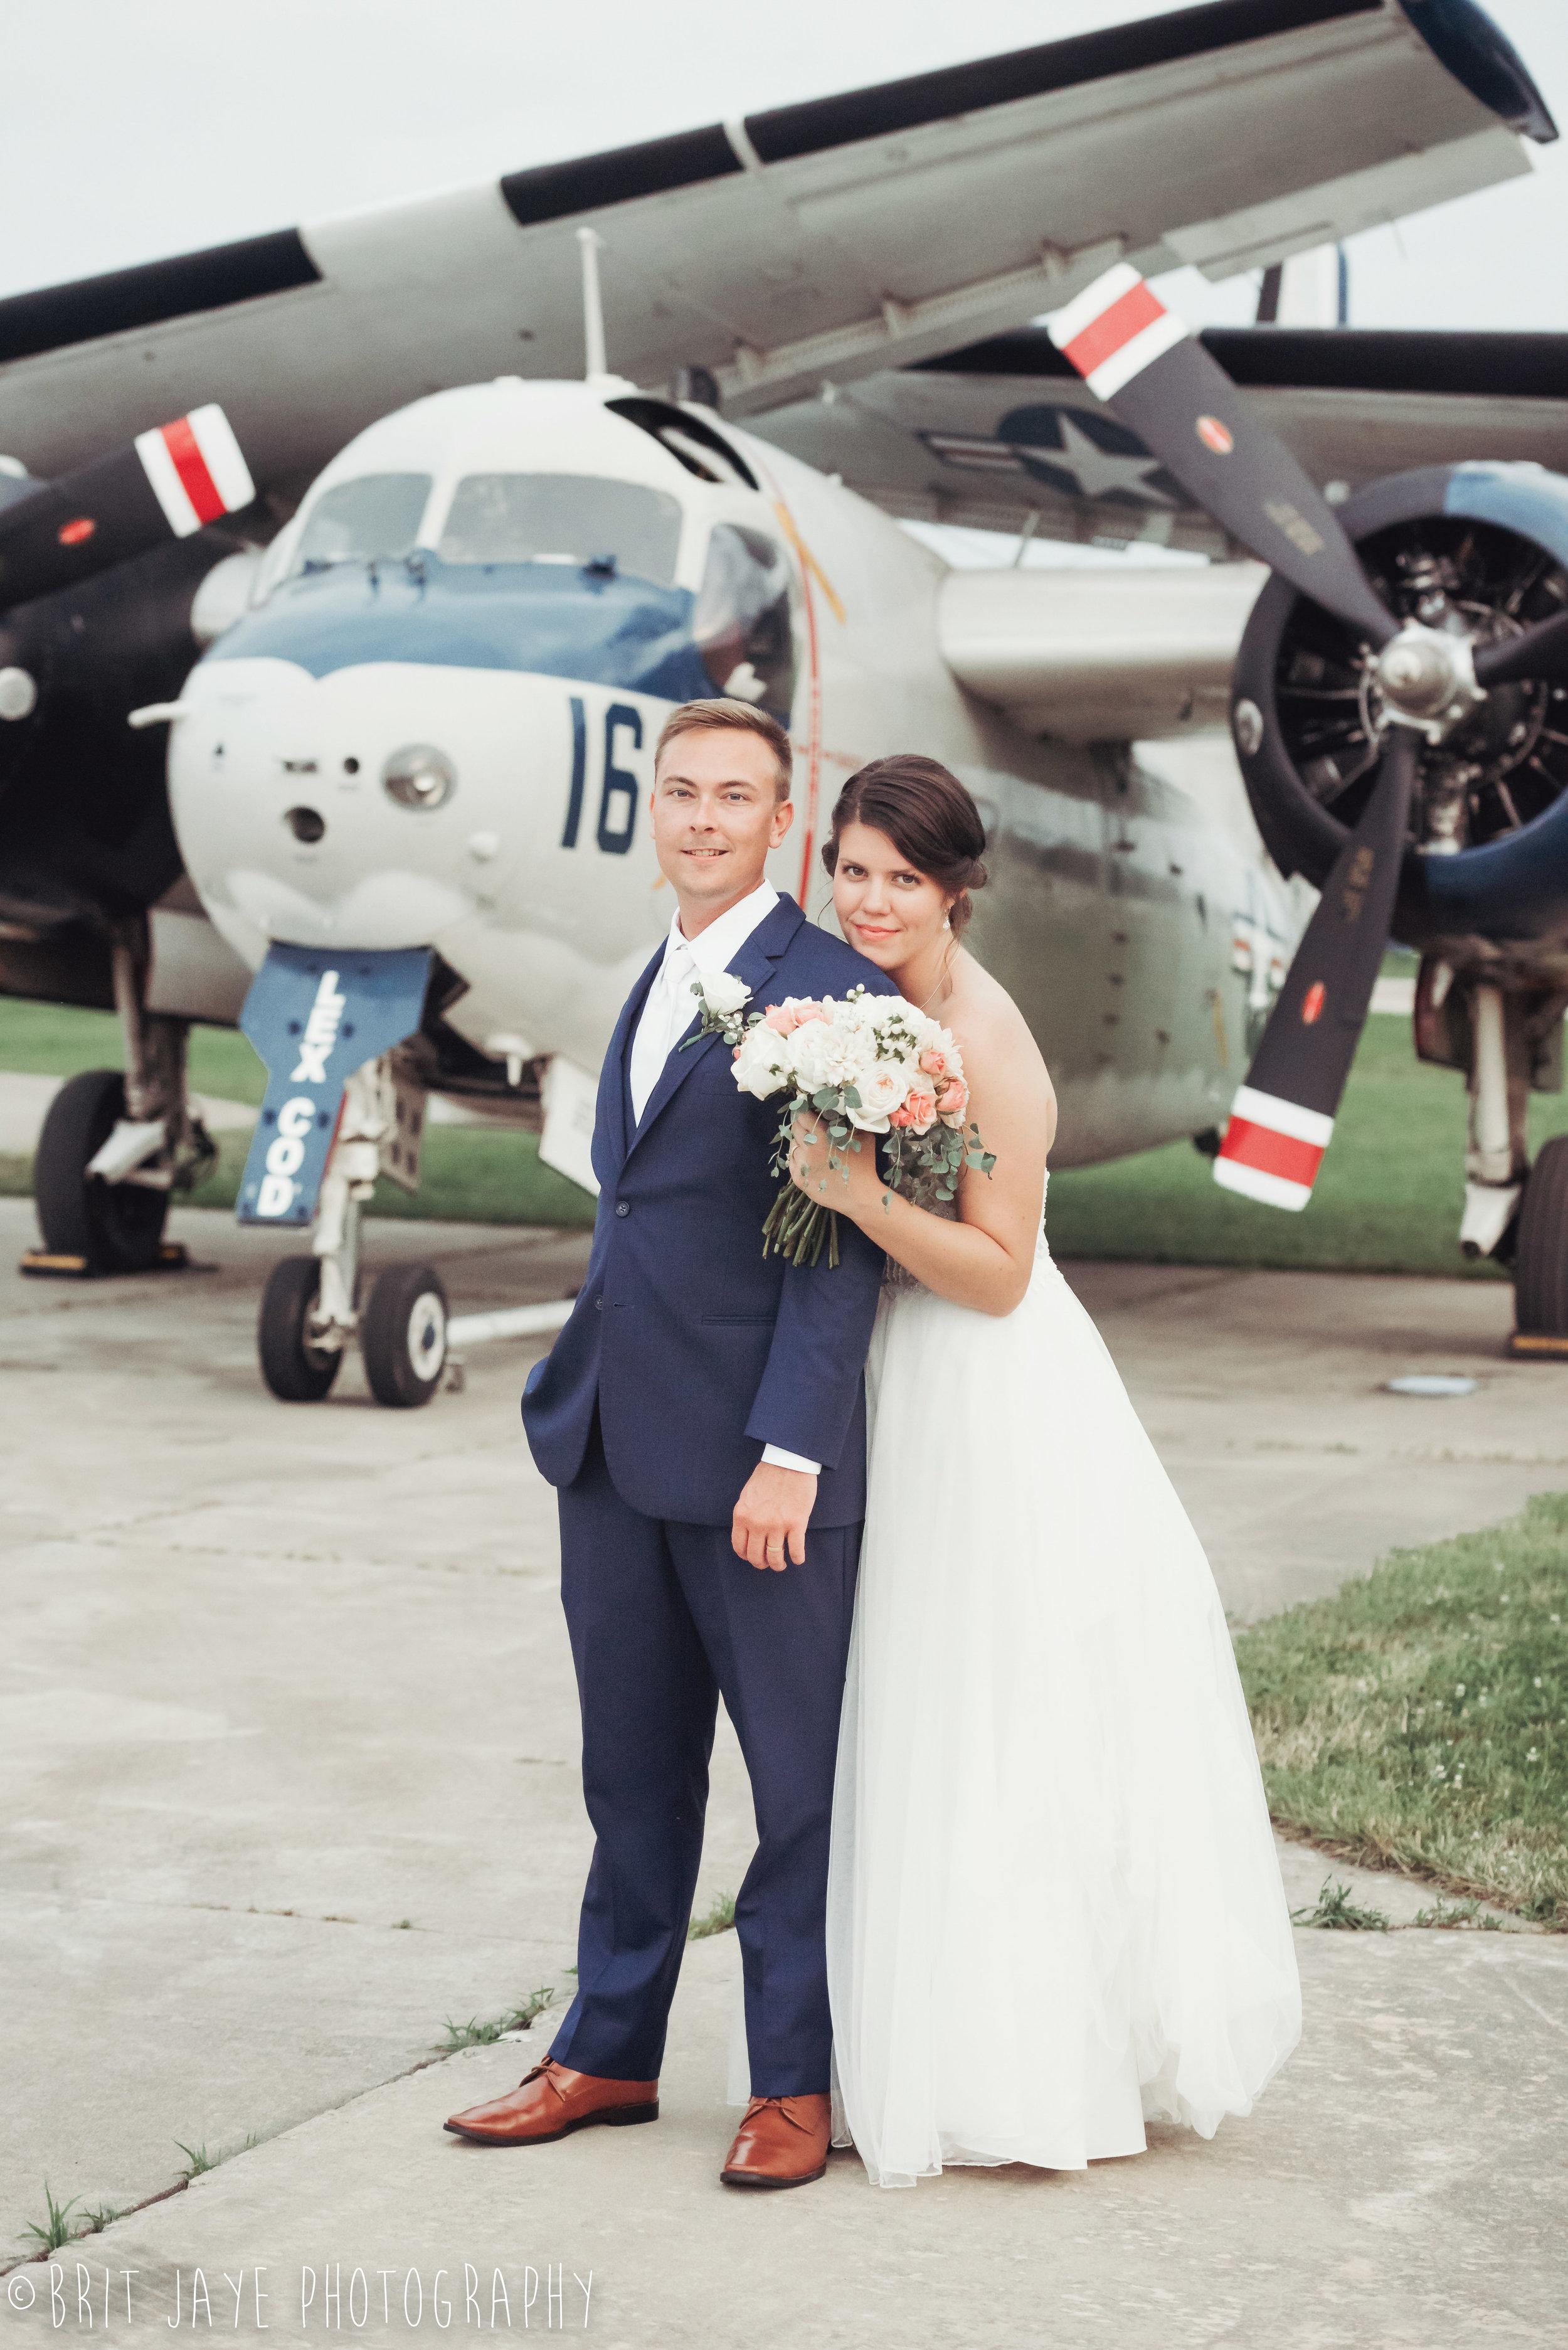 Champaign_aviation_museum_travel_inspired_wedding-84.jpg